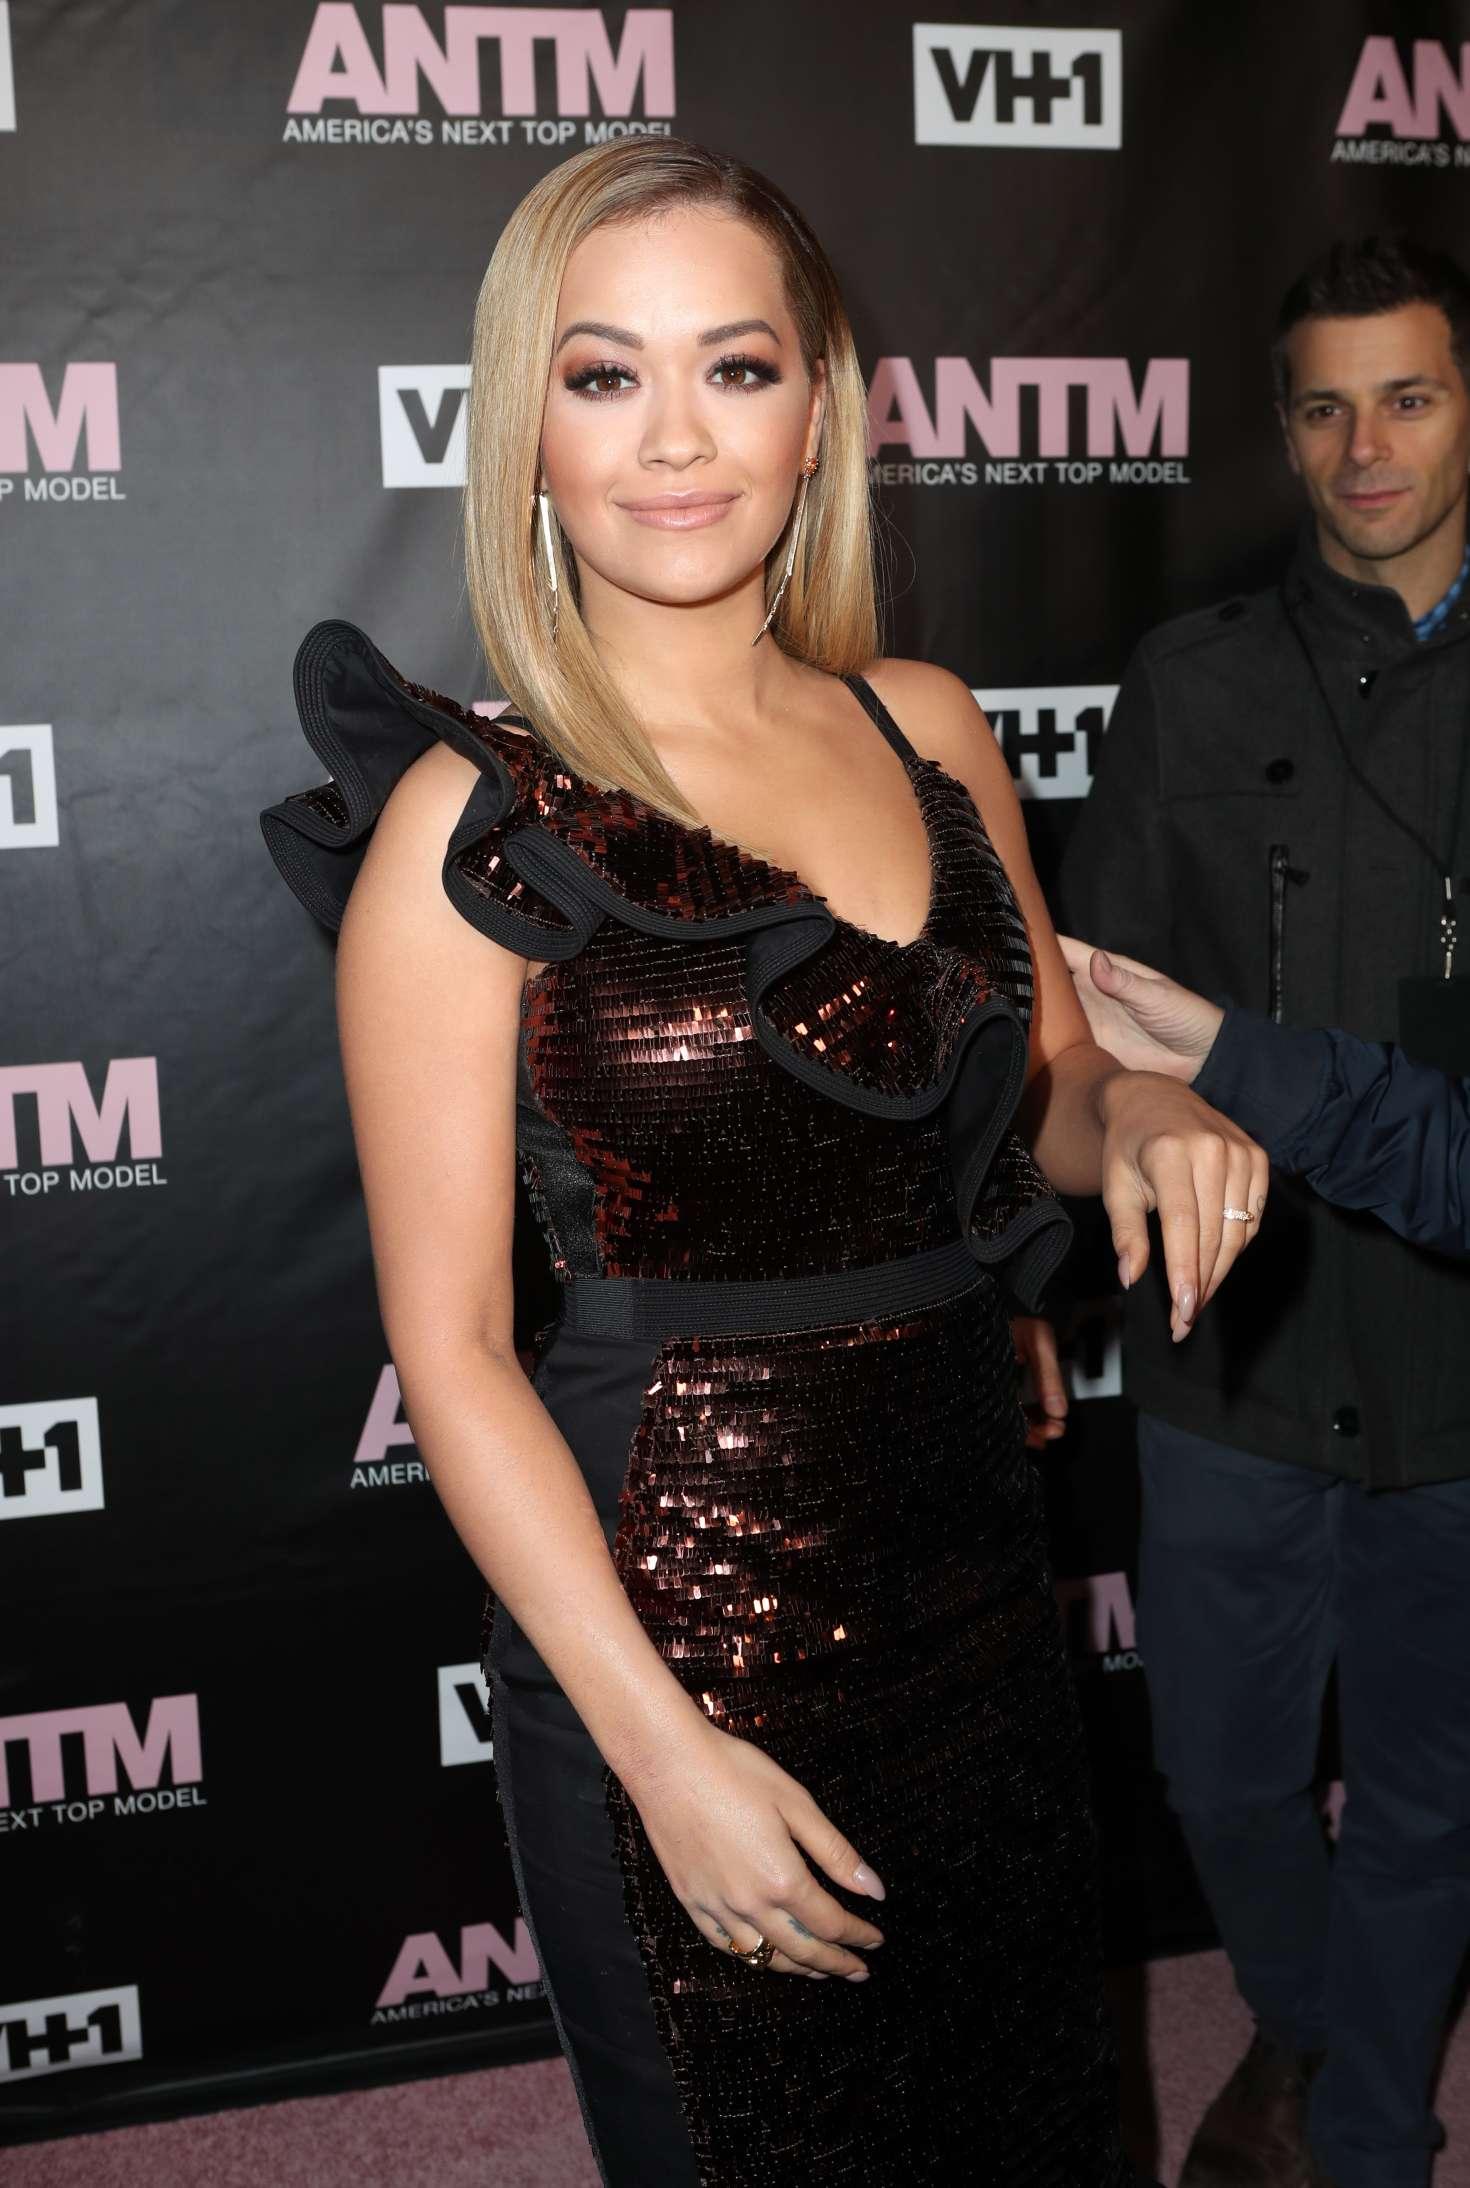 Rita Ora 2016 : Rita Ora: Americas Next Top Model Premiere Party -54